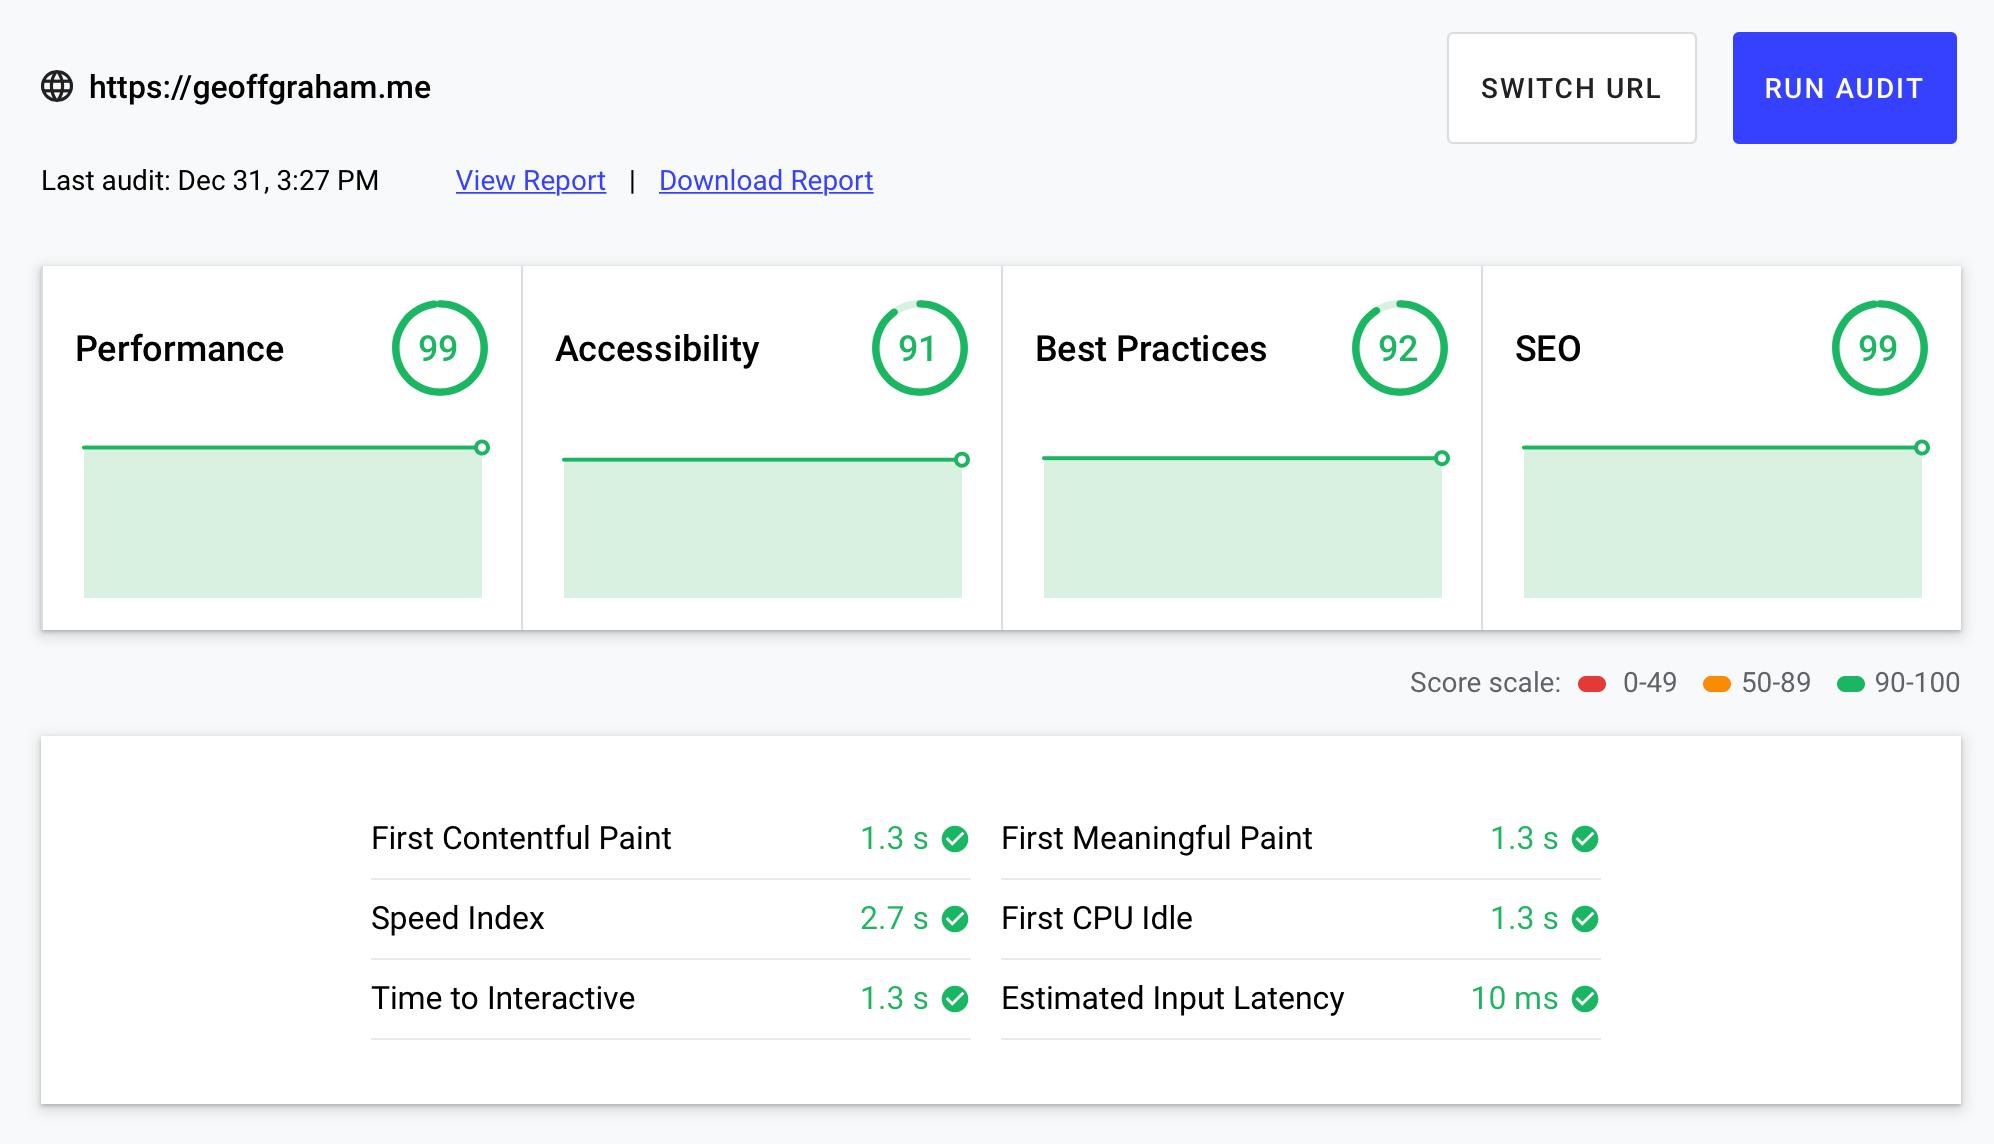 A Lighthouse screenshot showing a performance score of 99.